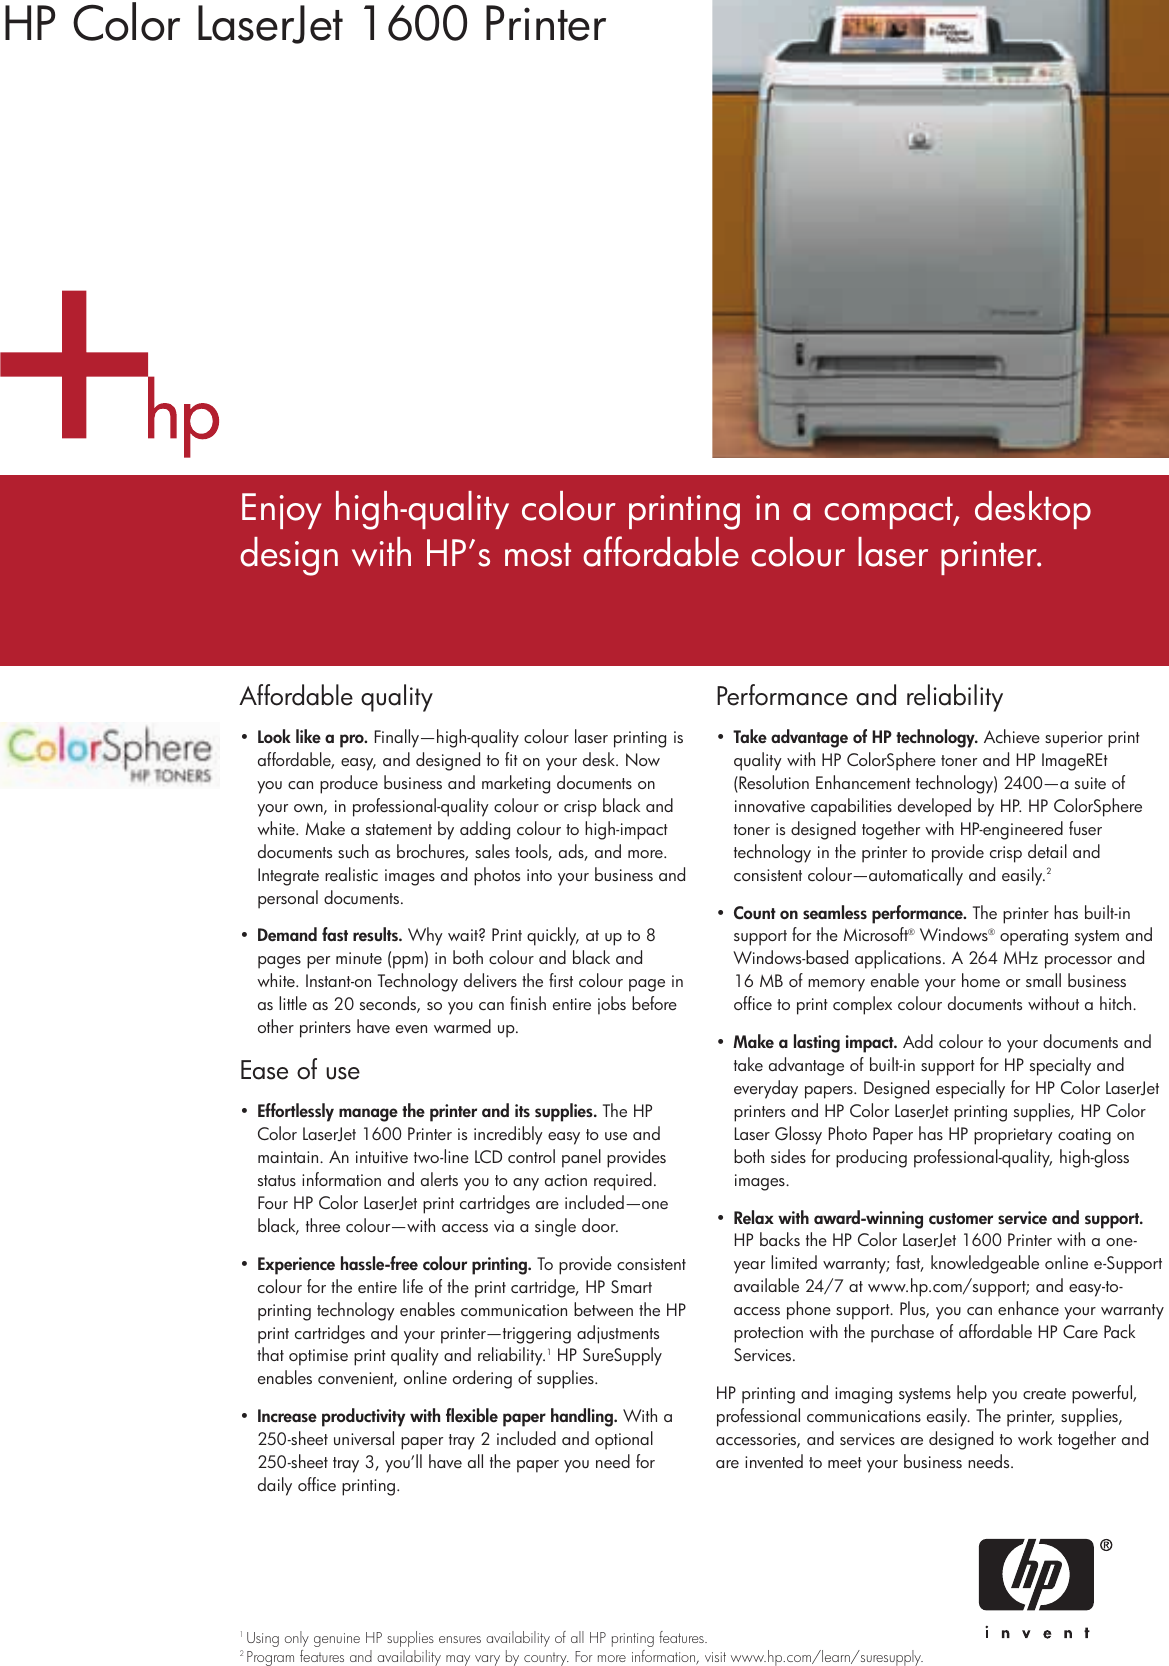 Hp color laserjet 1600 manual pdf.